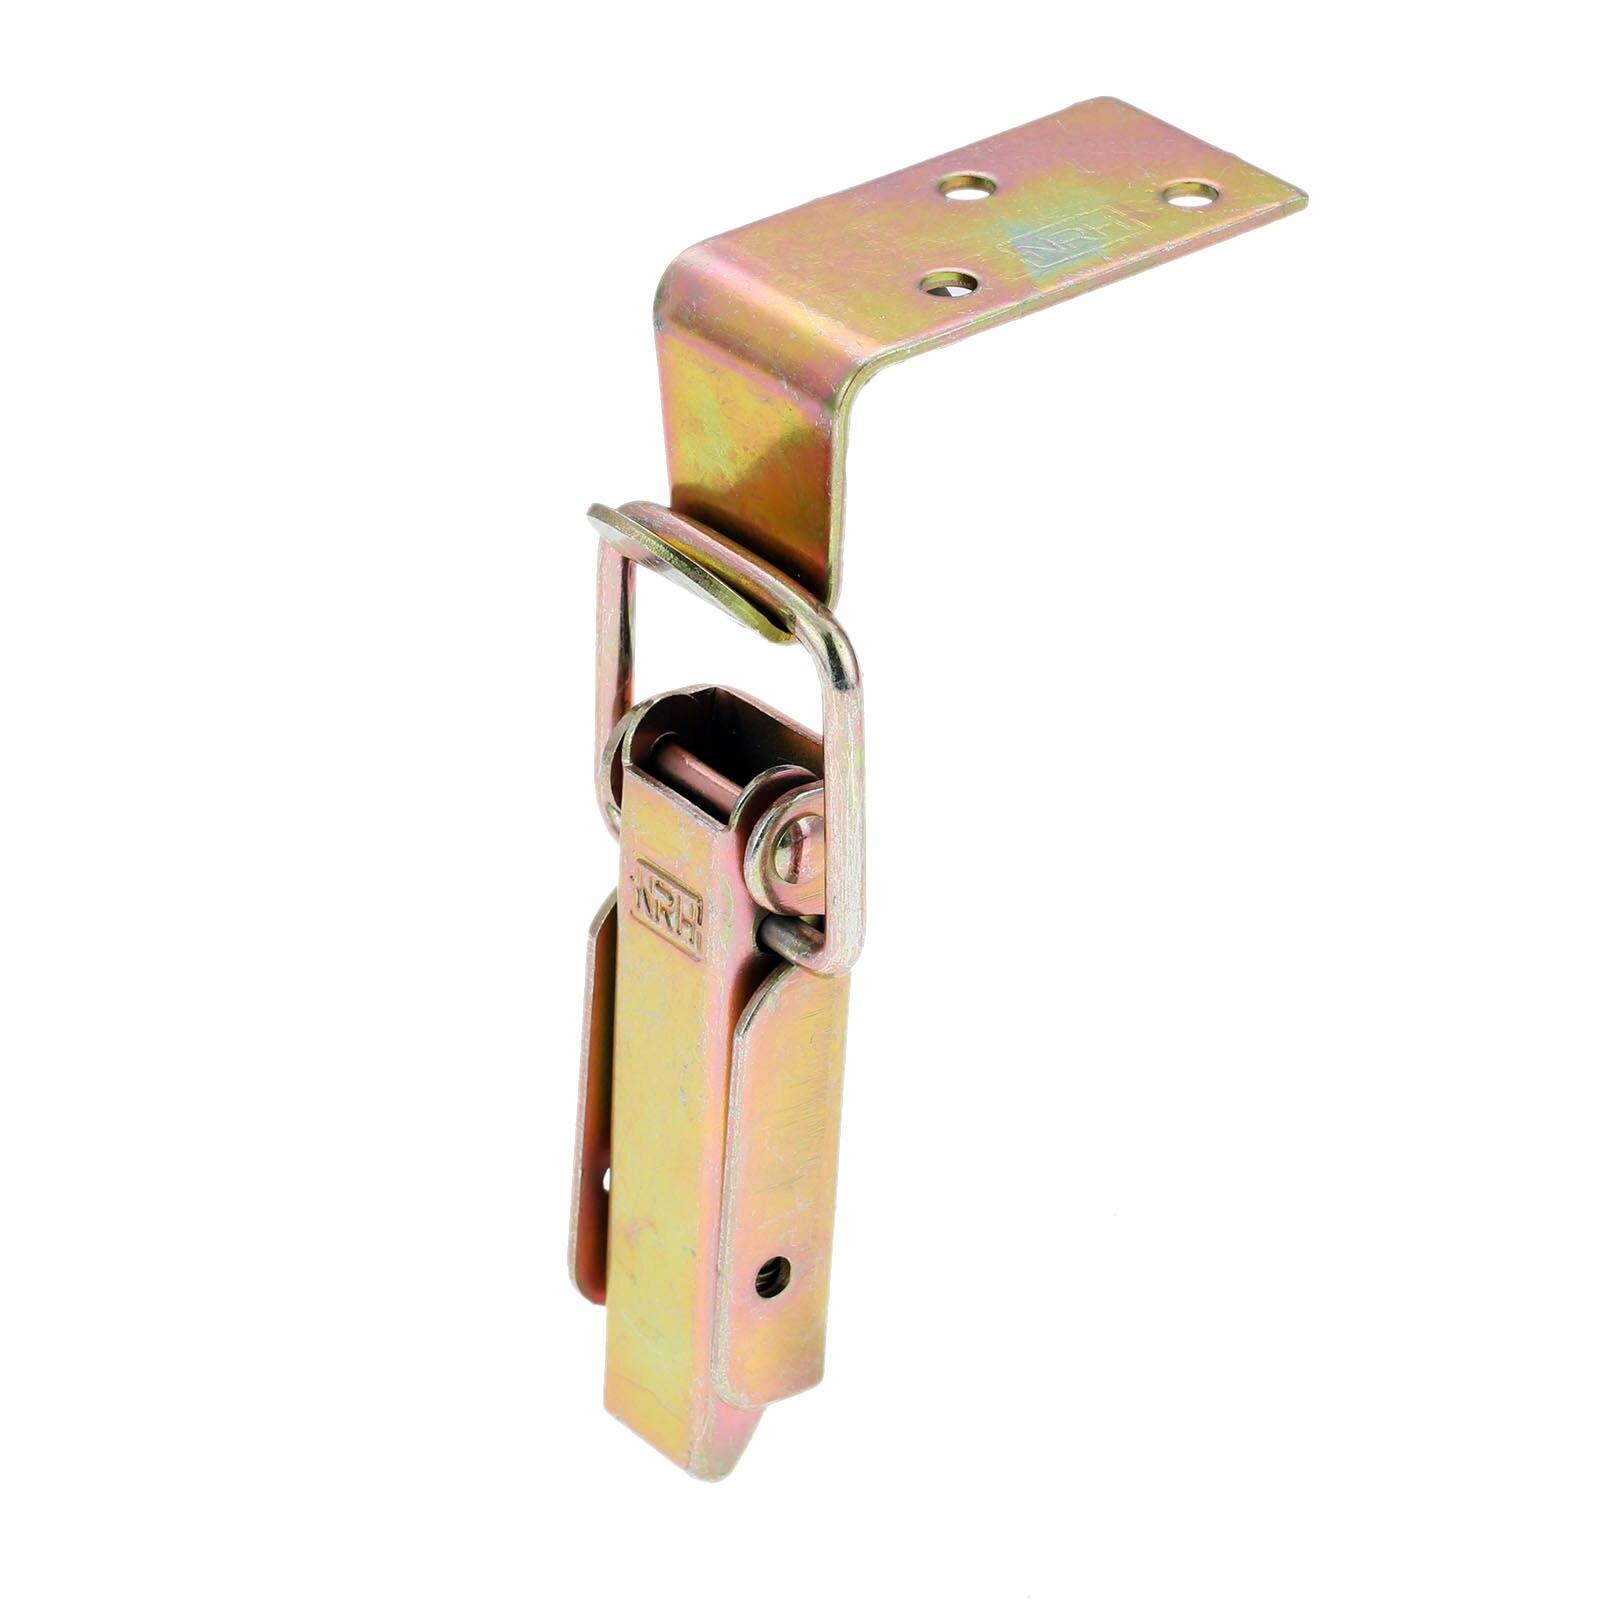 Wooden Box Catch Clasp Hasp Latch Lock Jewelry Box Padlock Toolbox Case Lock Latch Buckle Furniture Hardware 84*35mm